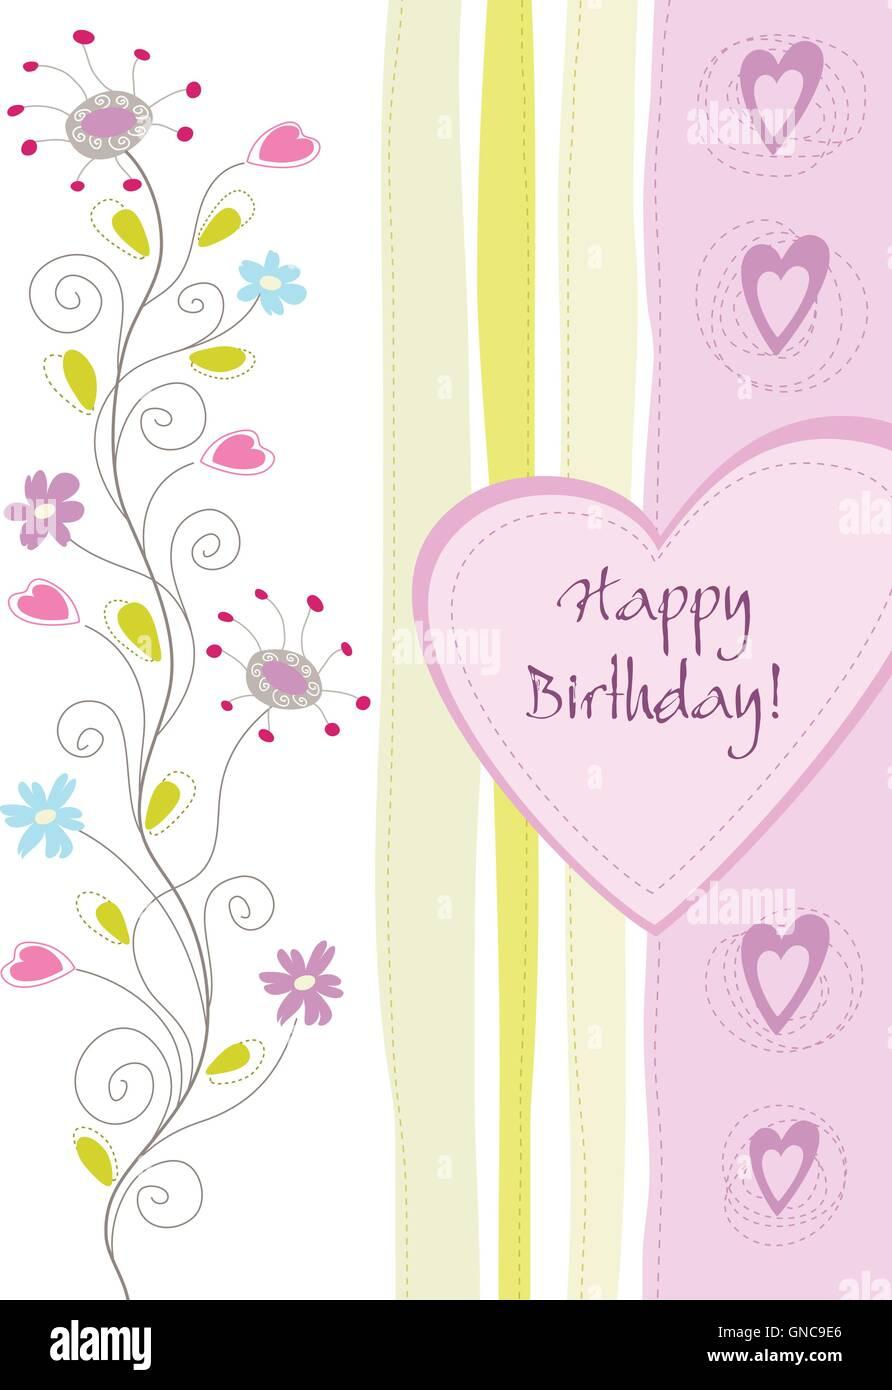 Happy birthday flowers swirls pastel stock photos happy birthday happy birthday floral greeting card stock image izmirmasajfo